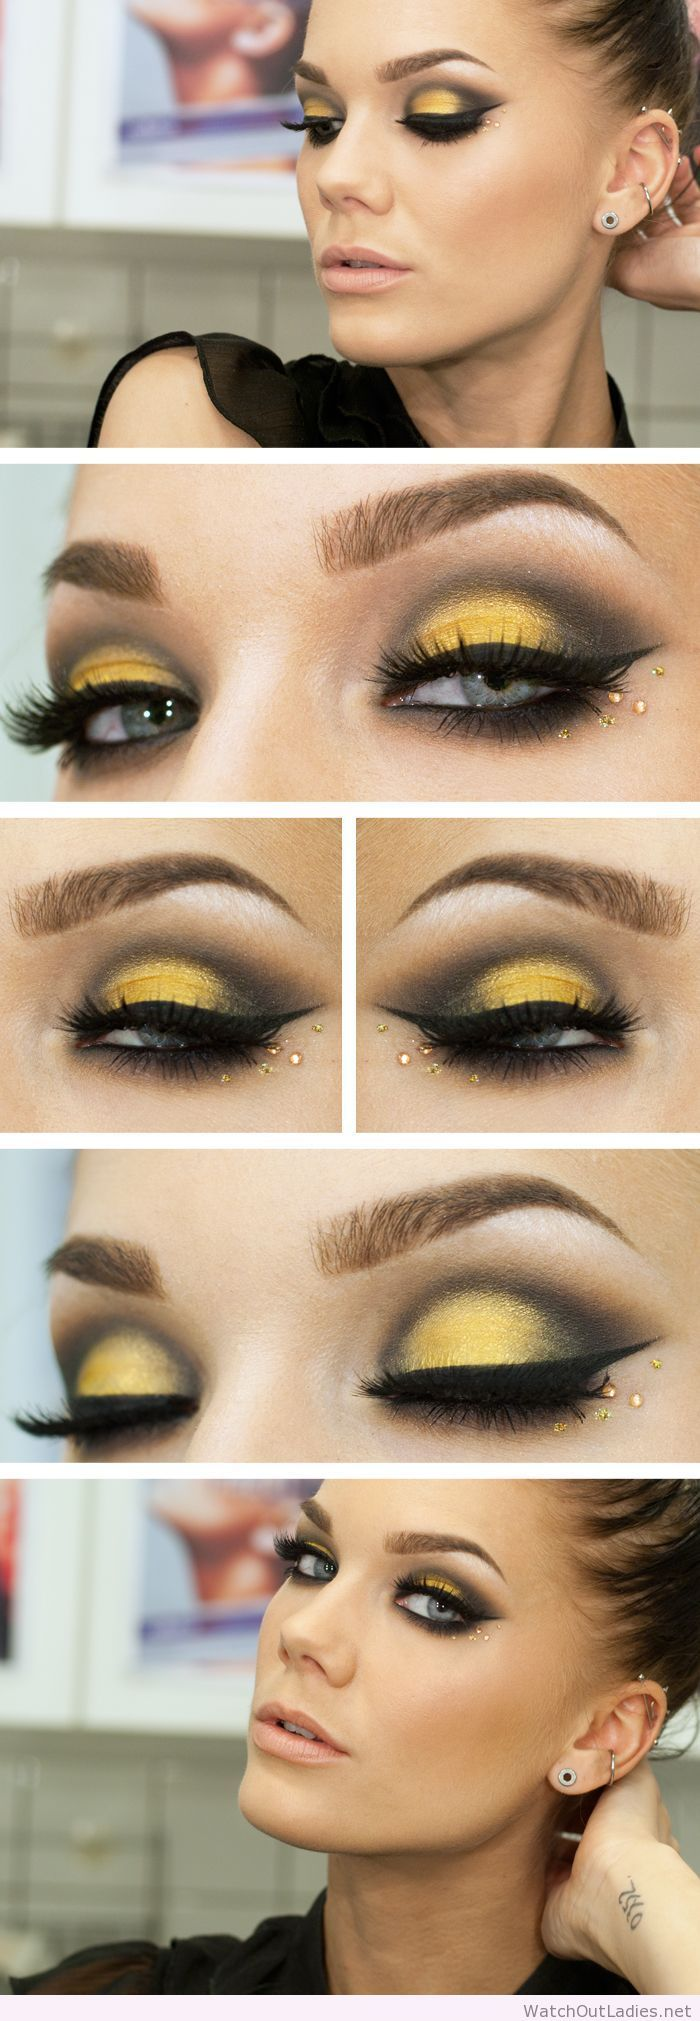 Linda Hallberg yellow and black eye makeup